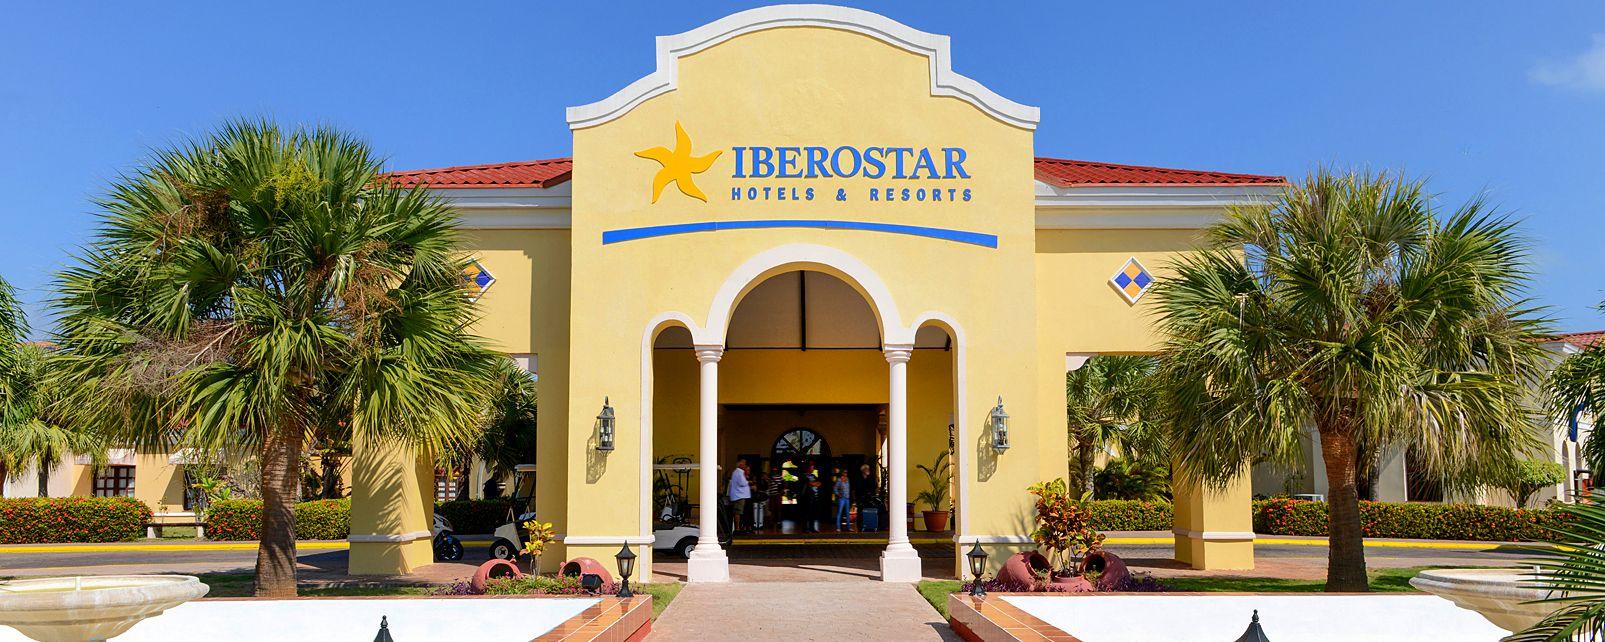 Hôtel Iberostar Playa Alameda